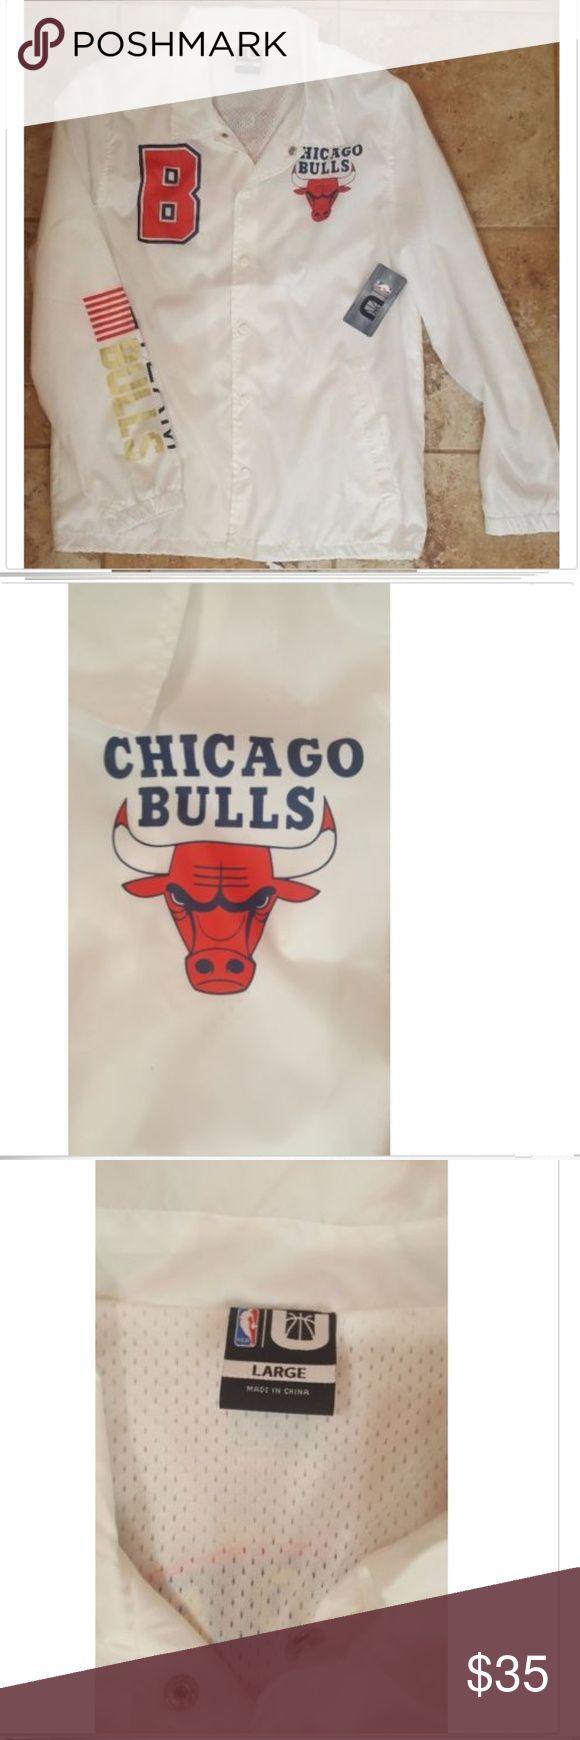 NWT Chicago Bulls NBA Windbreaker Large NWT Chicago Bulls NBA Windbreaker America's Team Size Large. New with Tags Men's Size Large NBA Chicago Bulls Windbreaker. One small mark on the back of the jacket - see pic. NBA Jackets & Coats Windbreakers